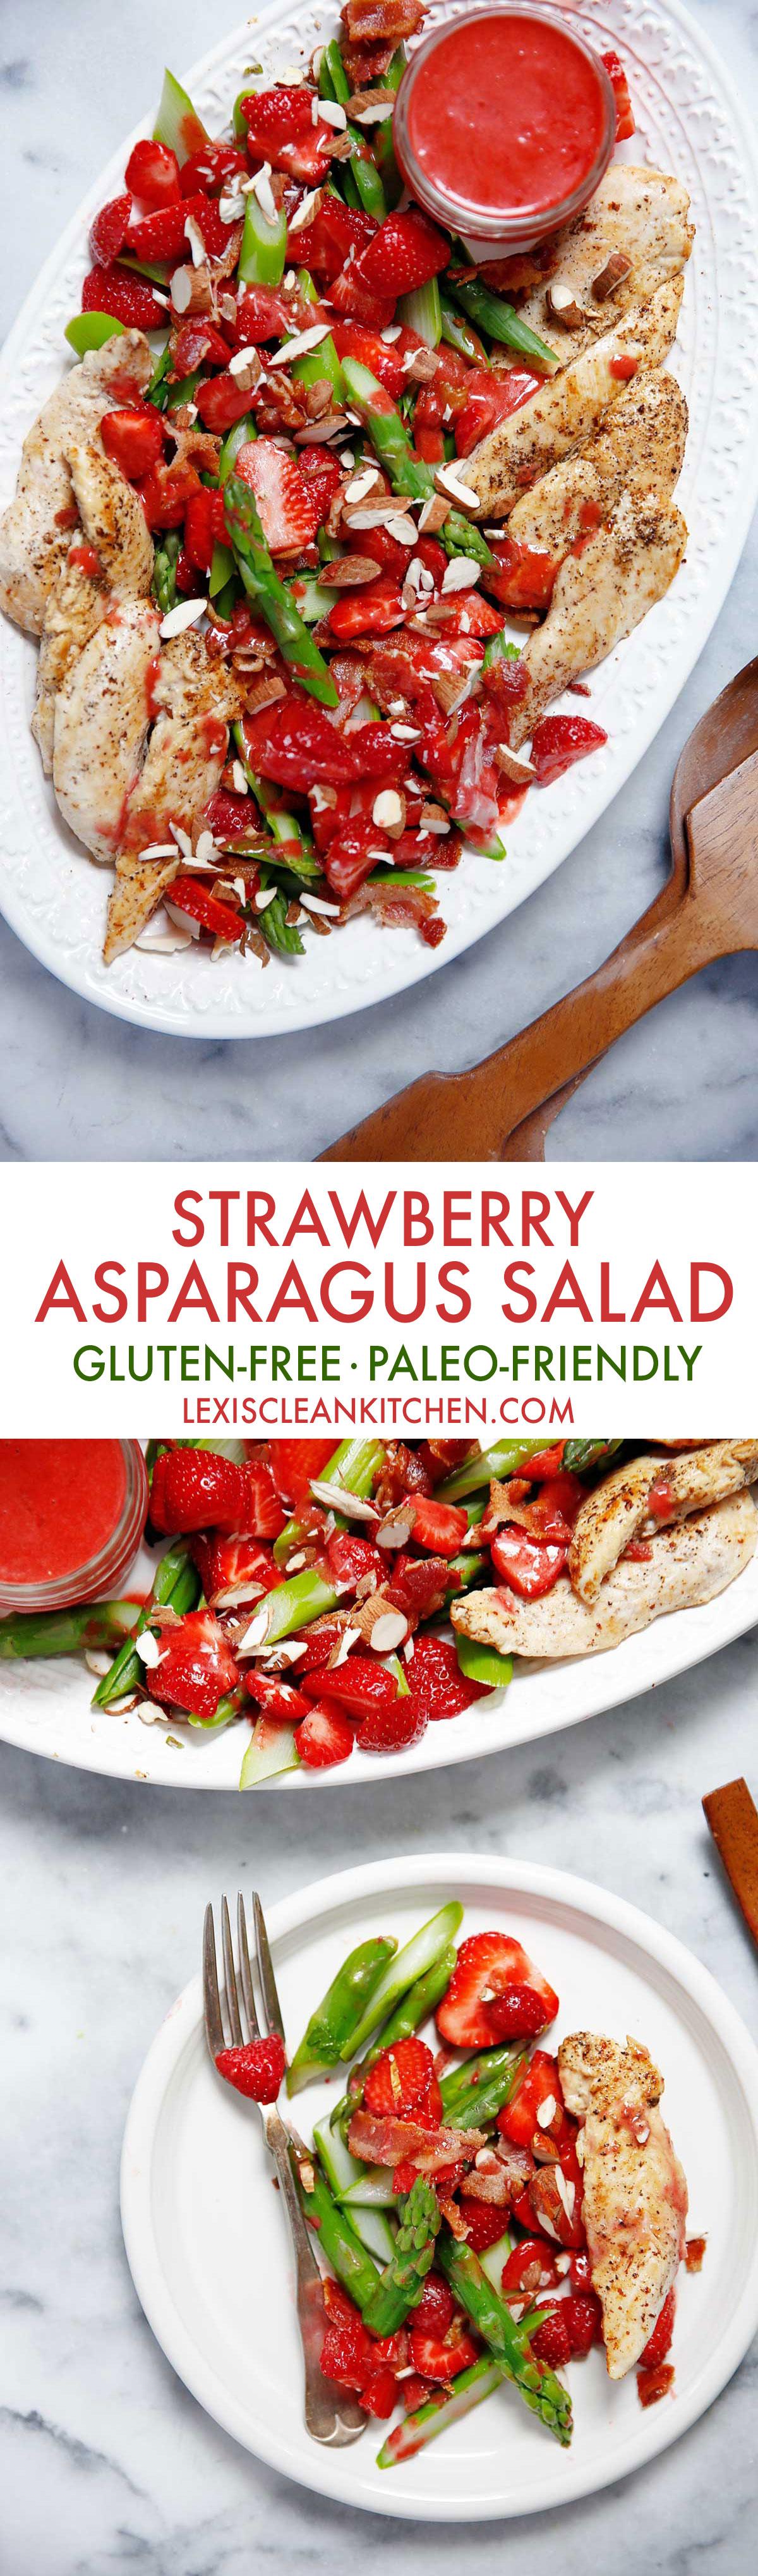 Strawberry Asparagus Salad [gluten-free, paleo-friendly, dairy-free]   Lexi's Clean Kitchen